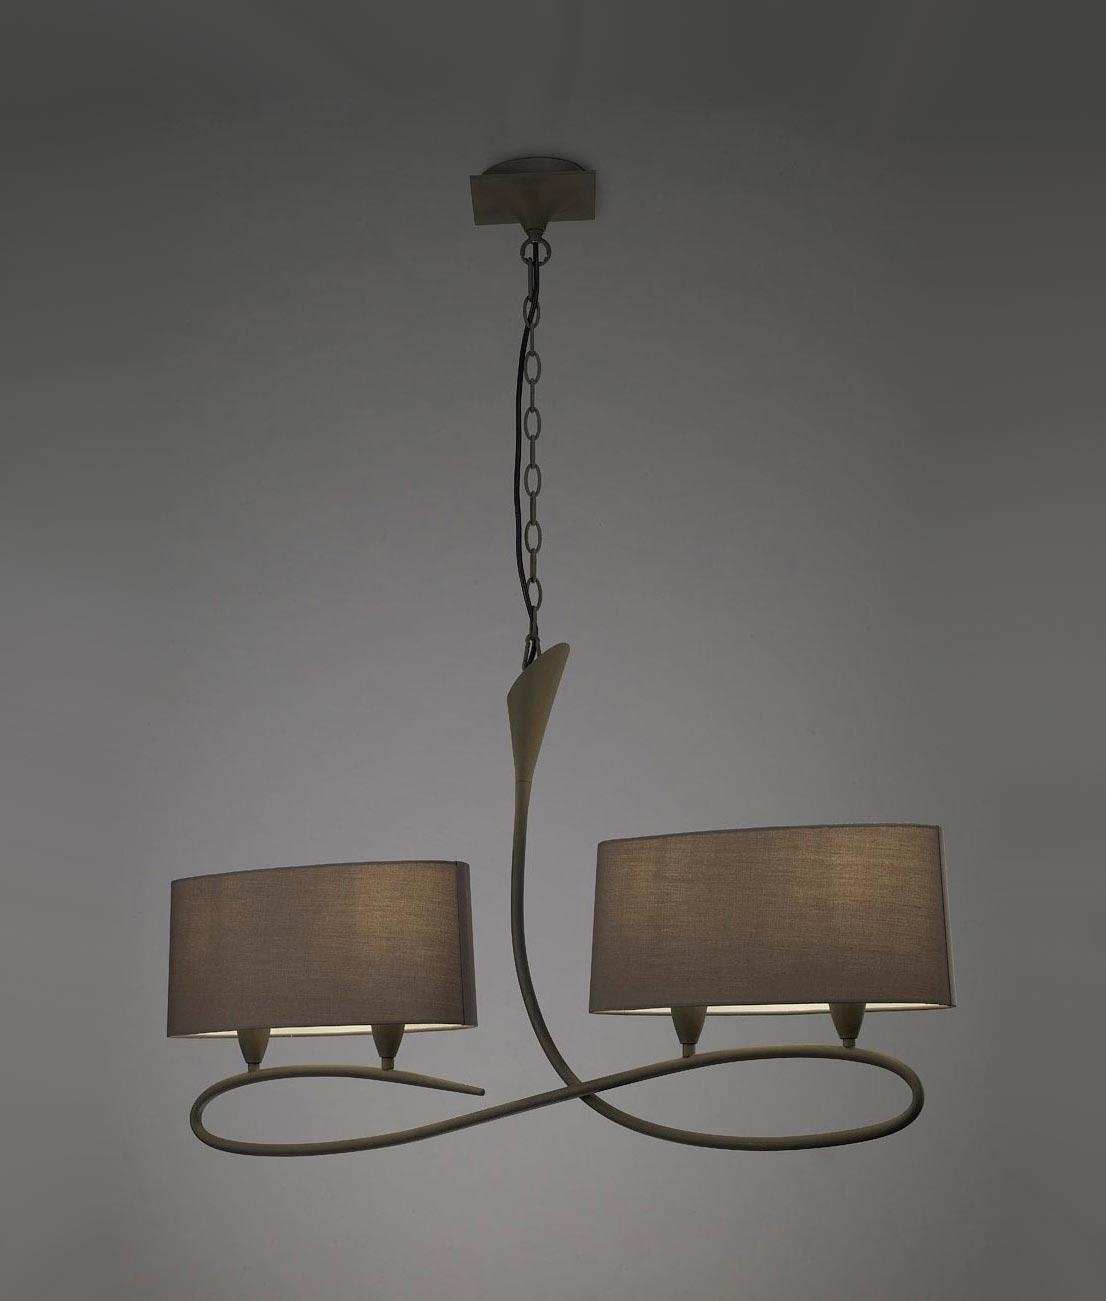 L mpara lineal gris ceniza lua 4 luces la casa de la l mpara - Casa de las lamparas ...